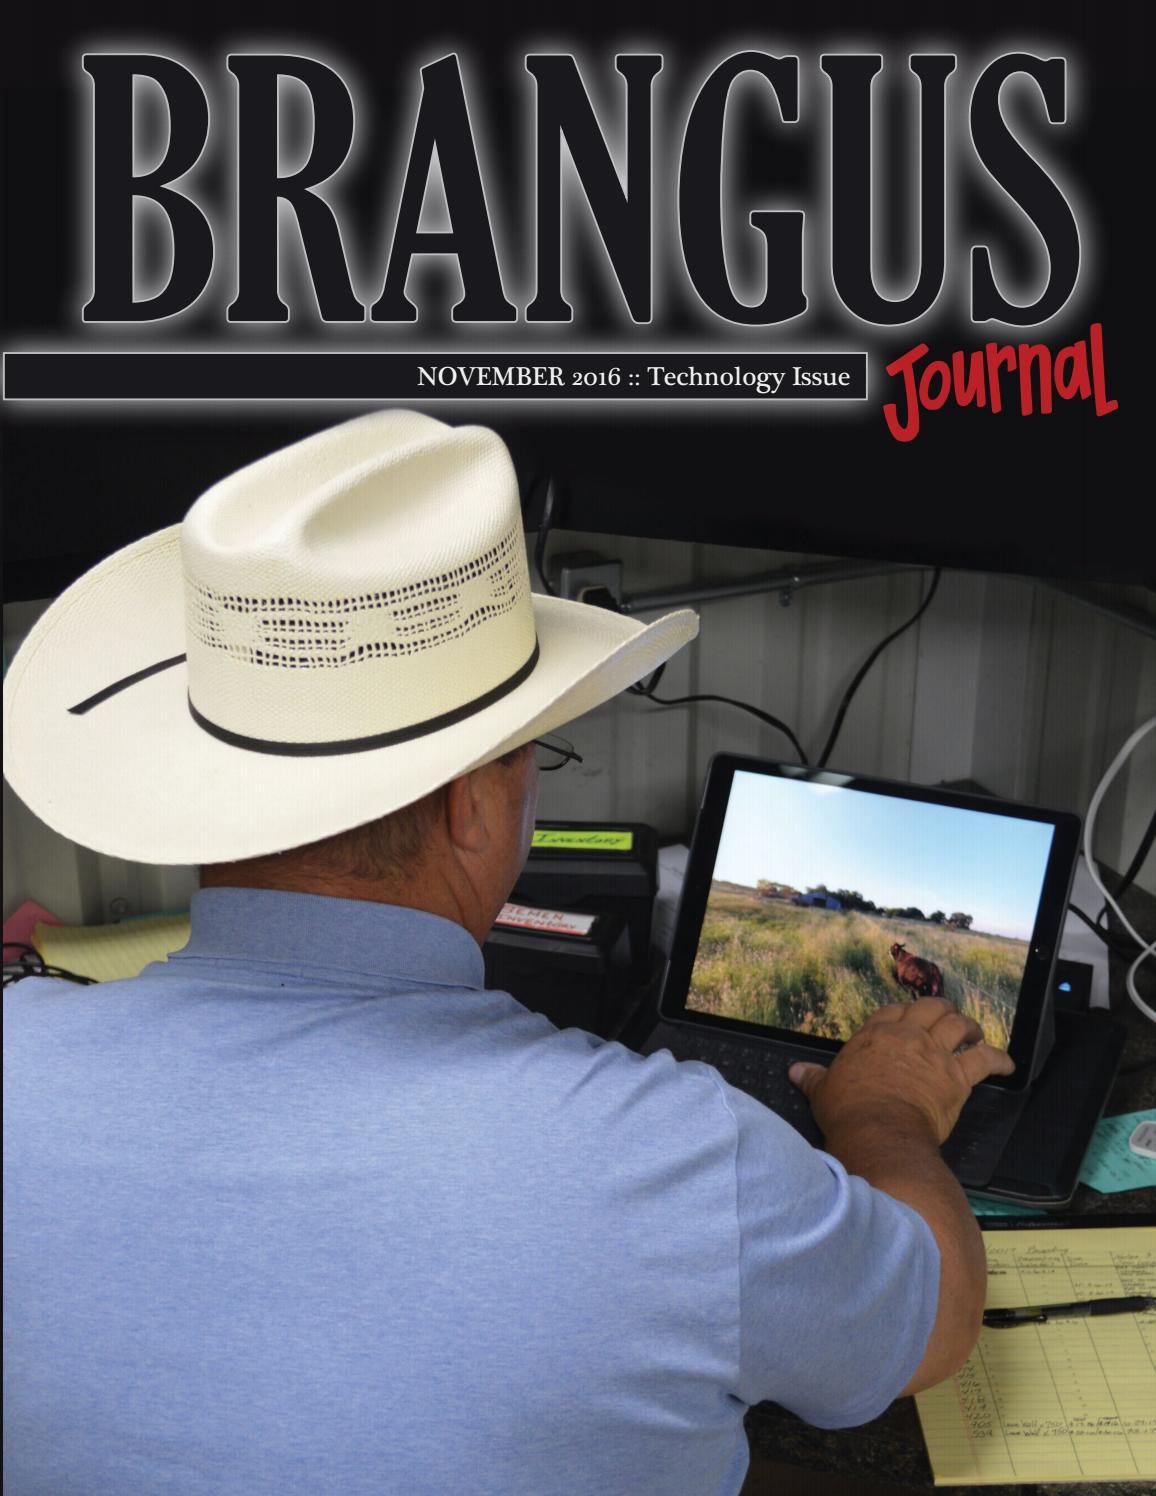 6f9182927d3 November 2016 Brangus Journal by International Brangus Breeders ...